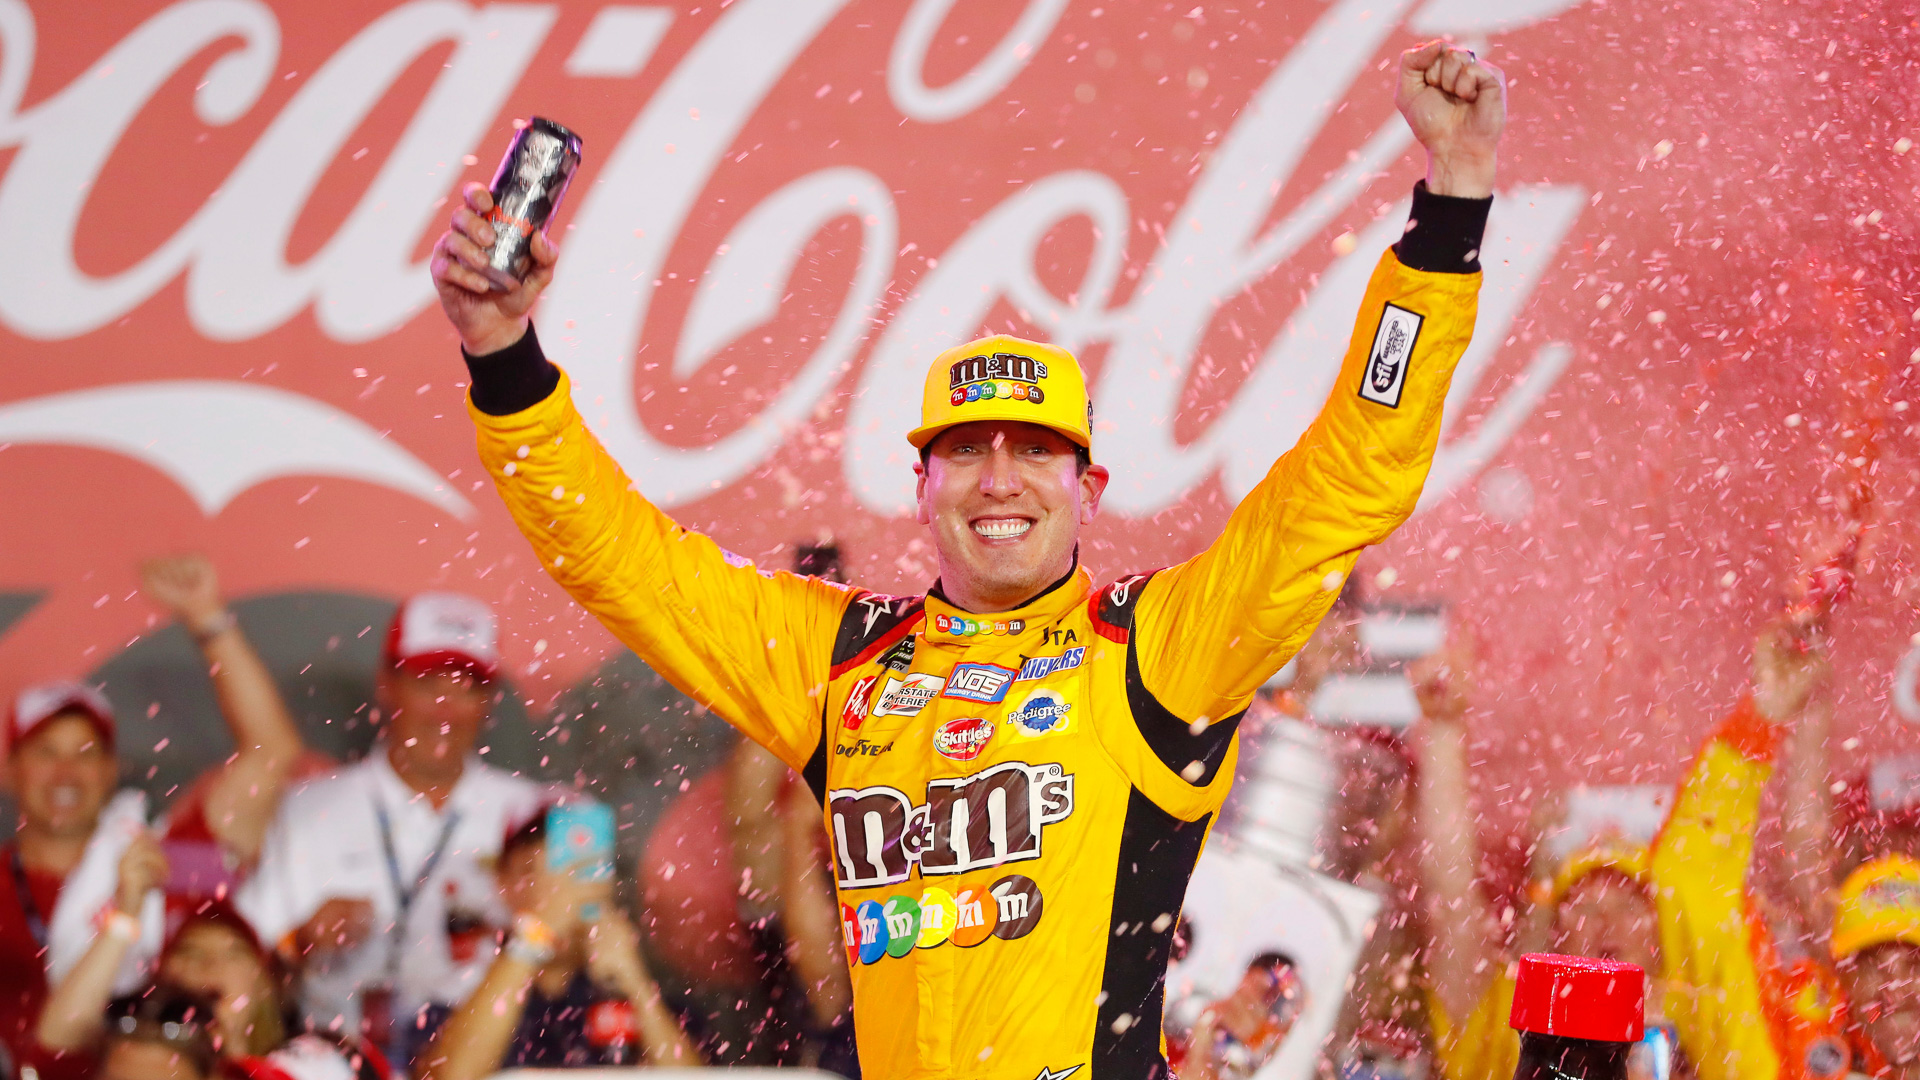 How Rich Is NASCAR Driver Kyle Busch?